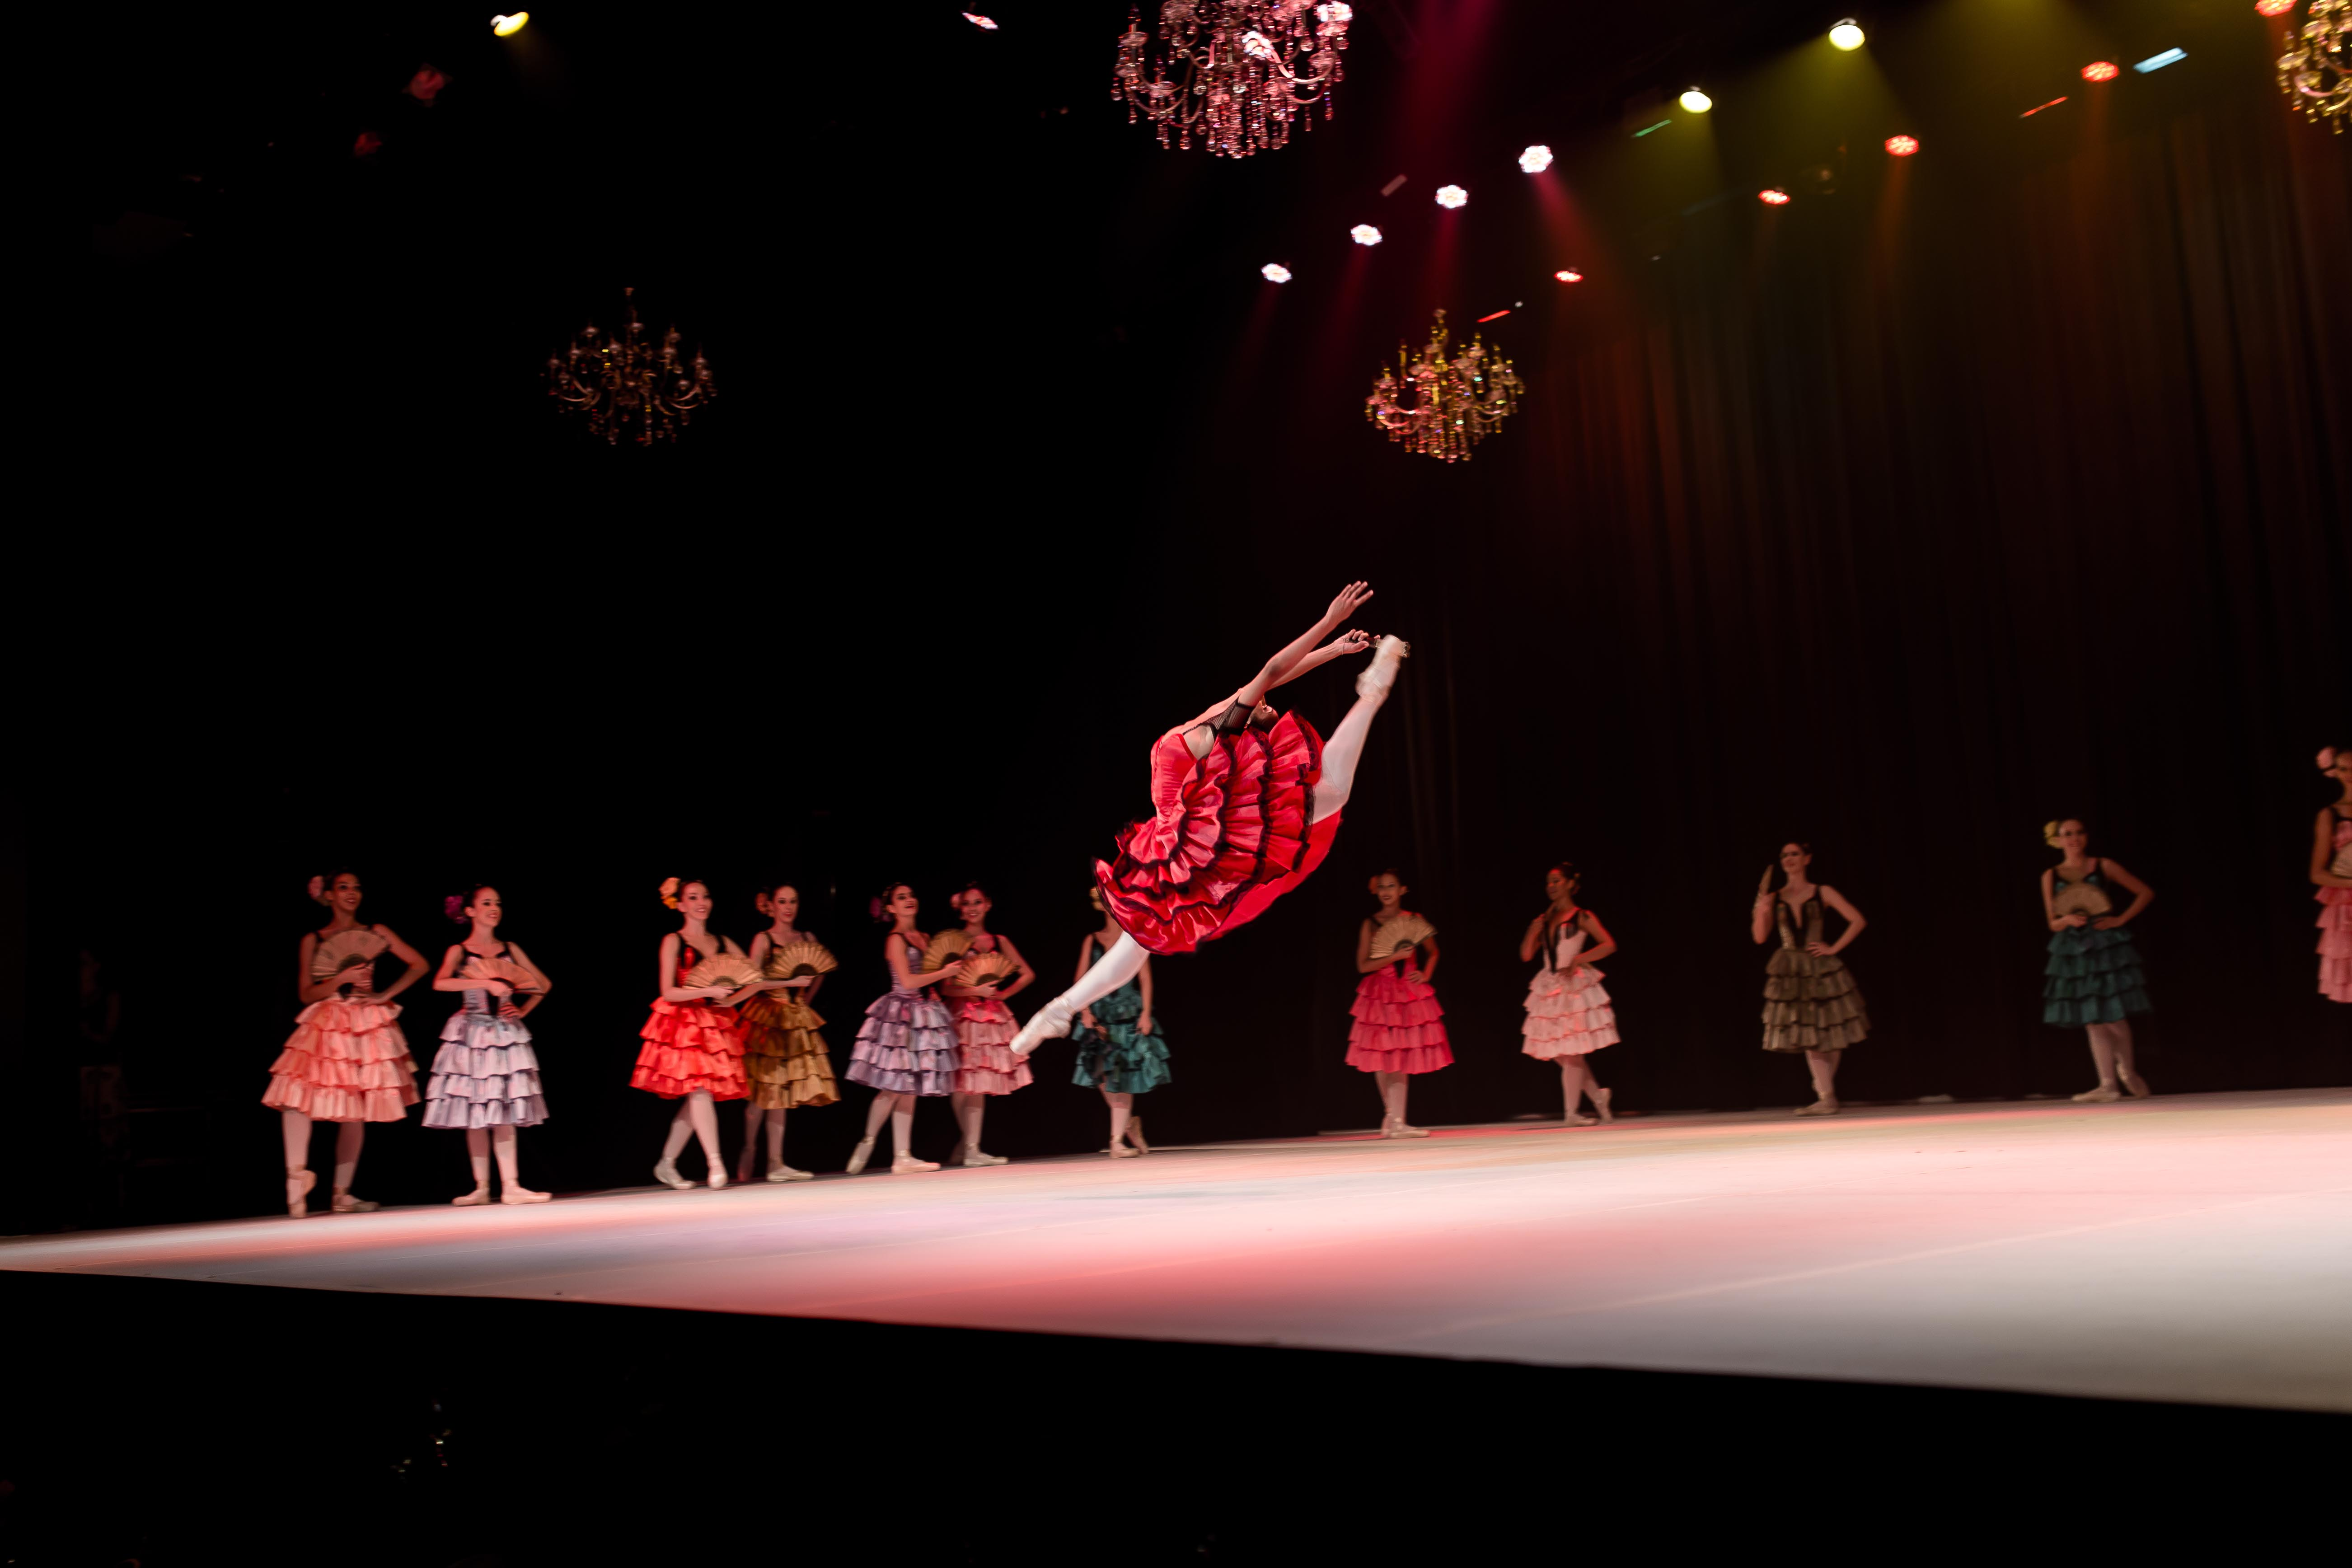 Opera ballet e Orquestra UFMT